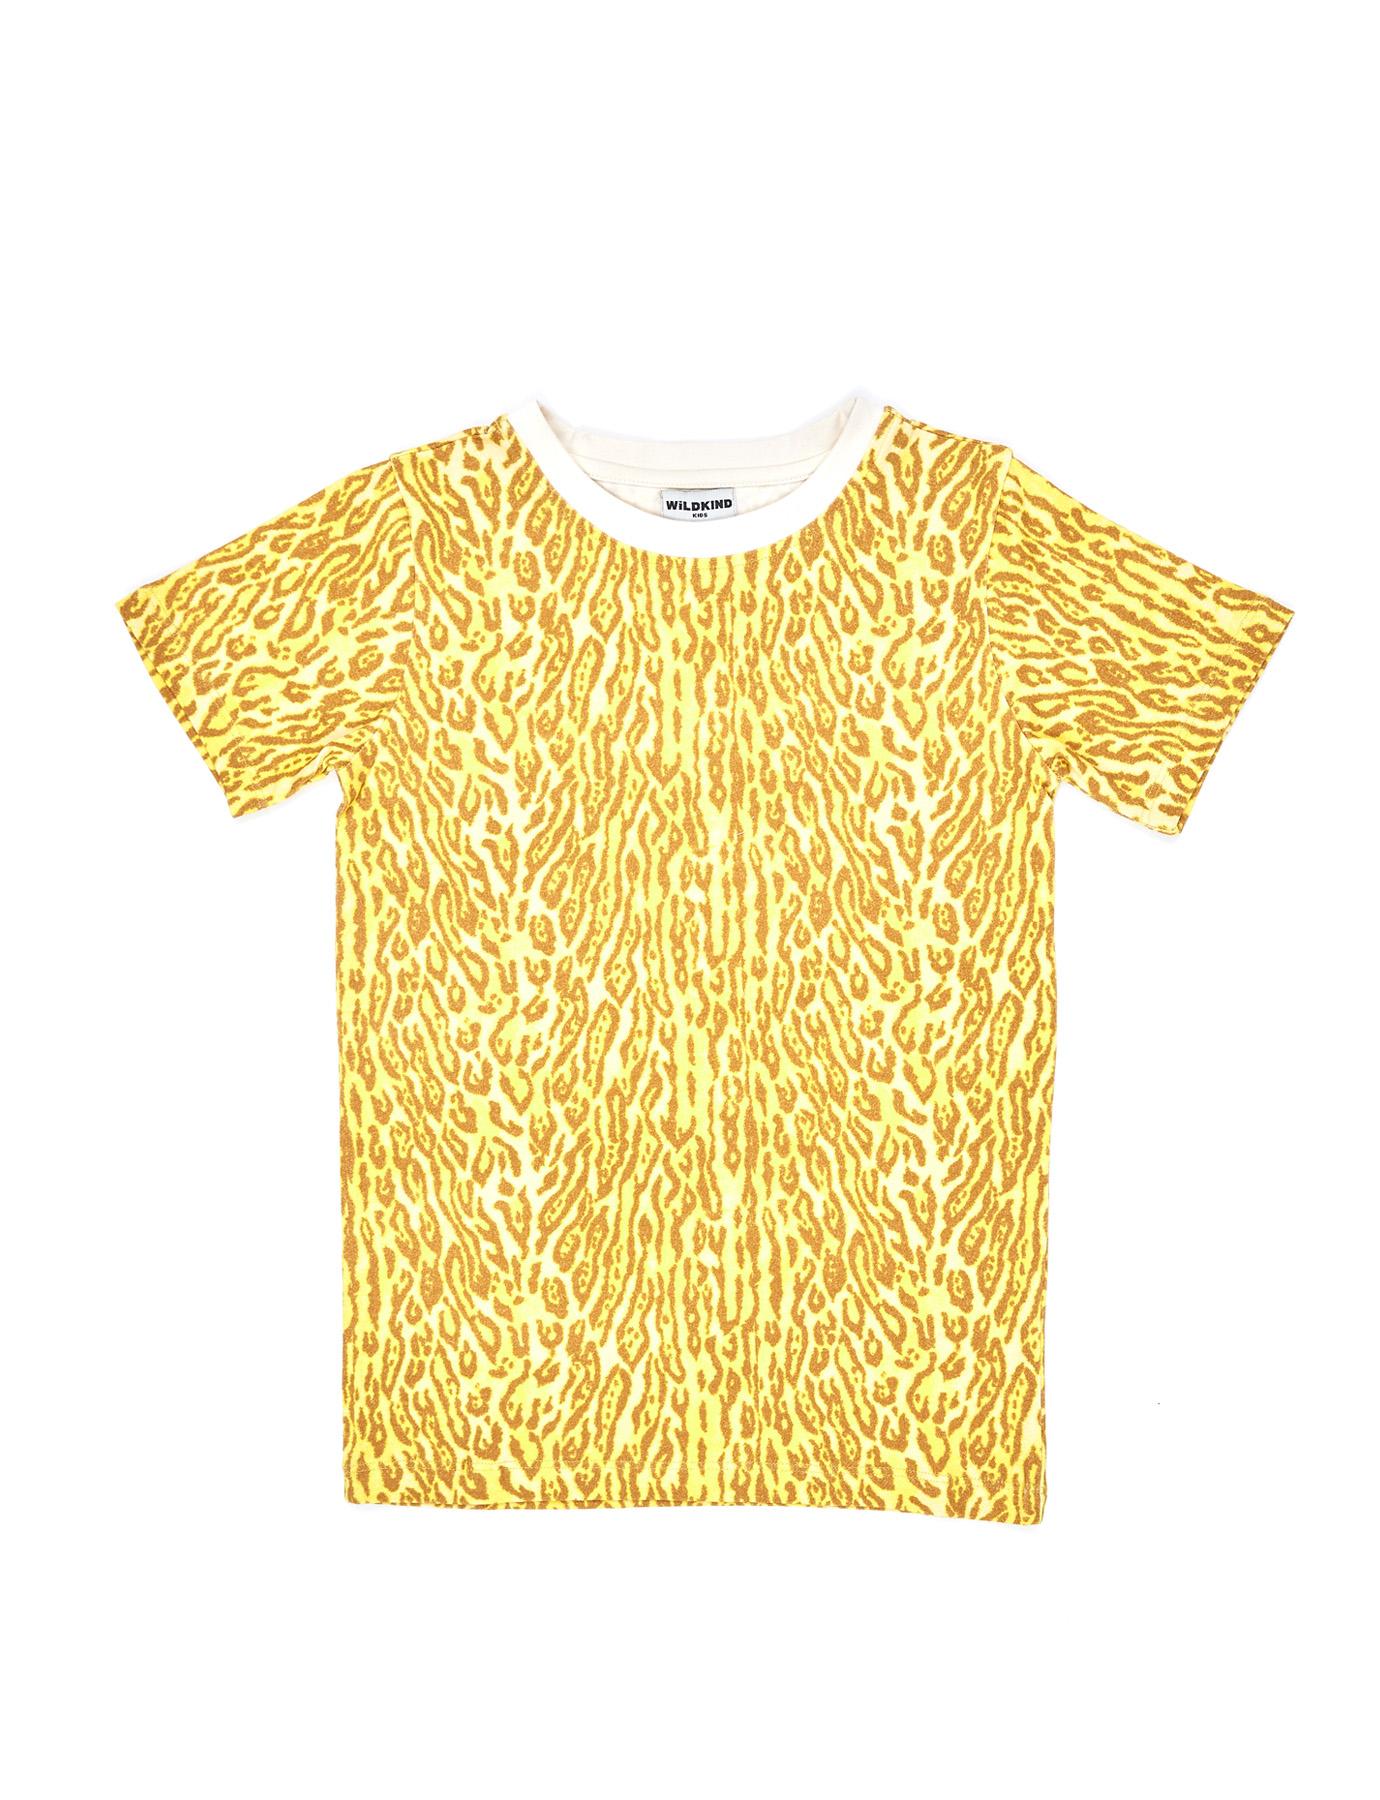 Lance_long_tee_leopard_yellow_44€.jpg